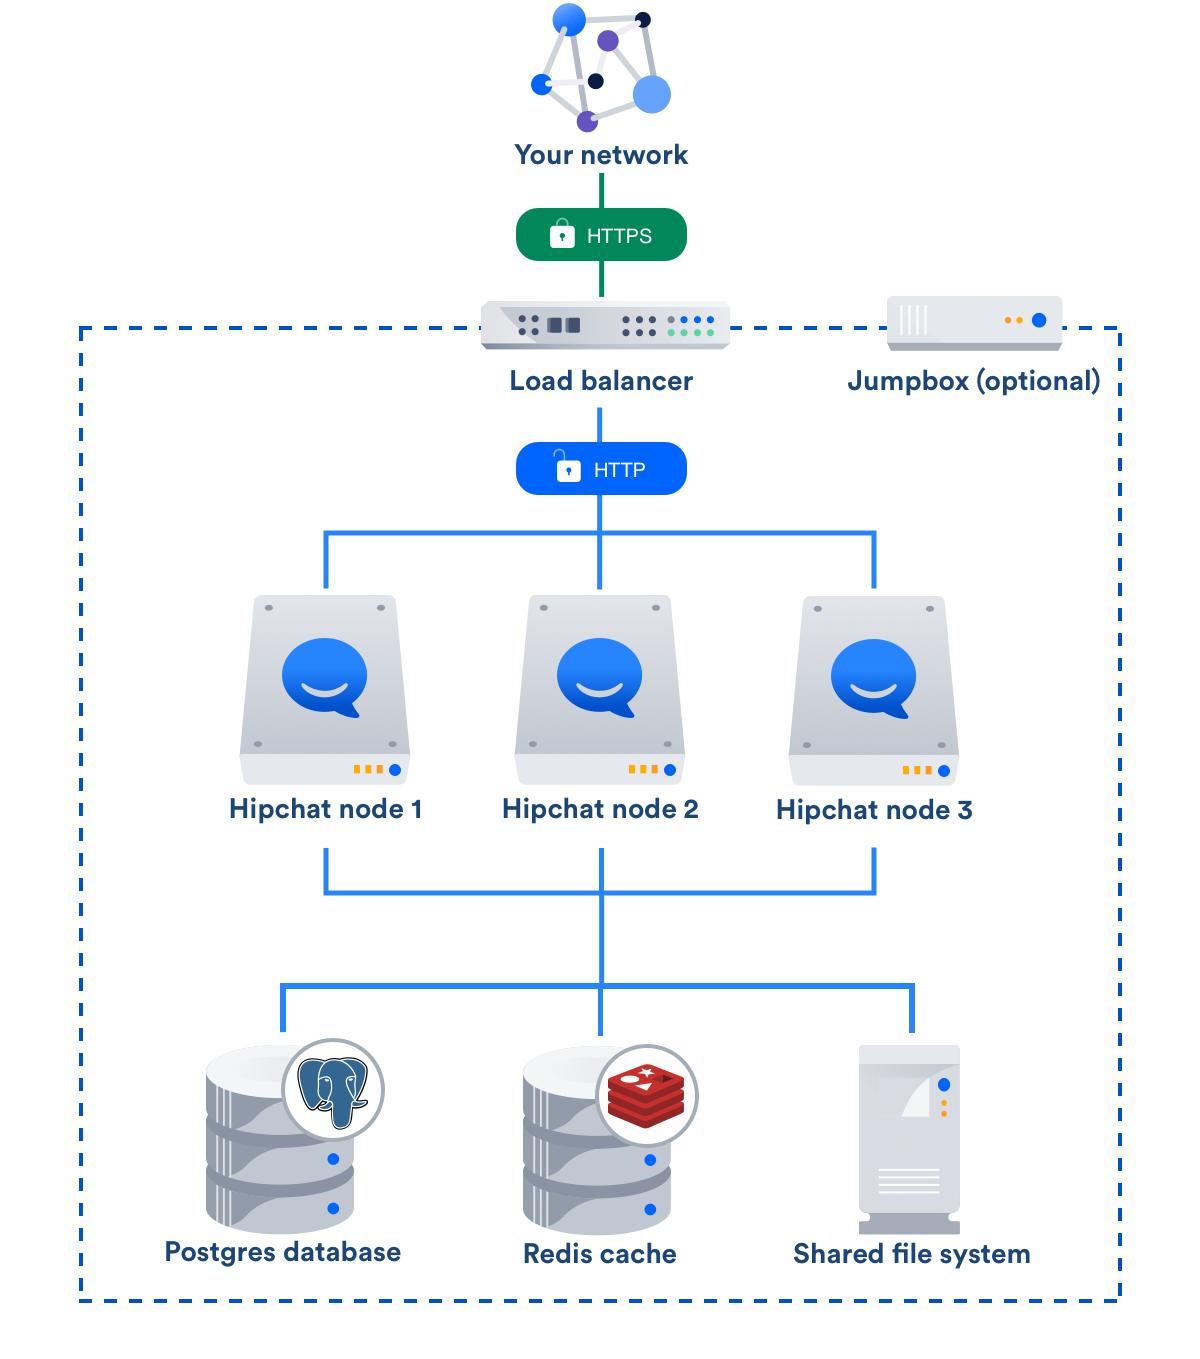 An Enterprise Scale Deployment Of Hipchat Data Center